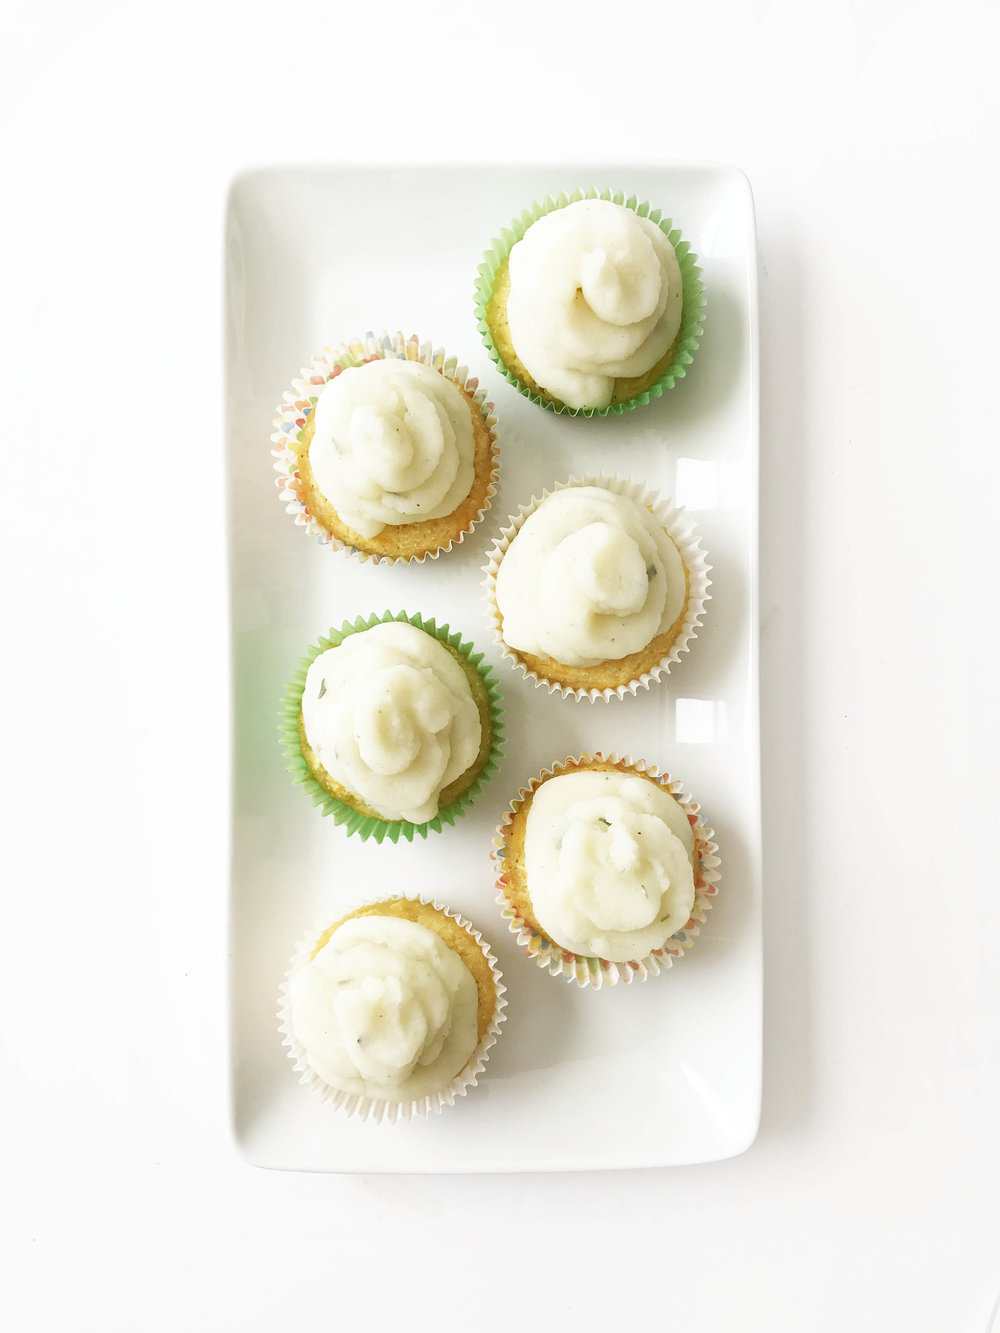 cornbread-chicken-cupcakes16.jpg